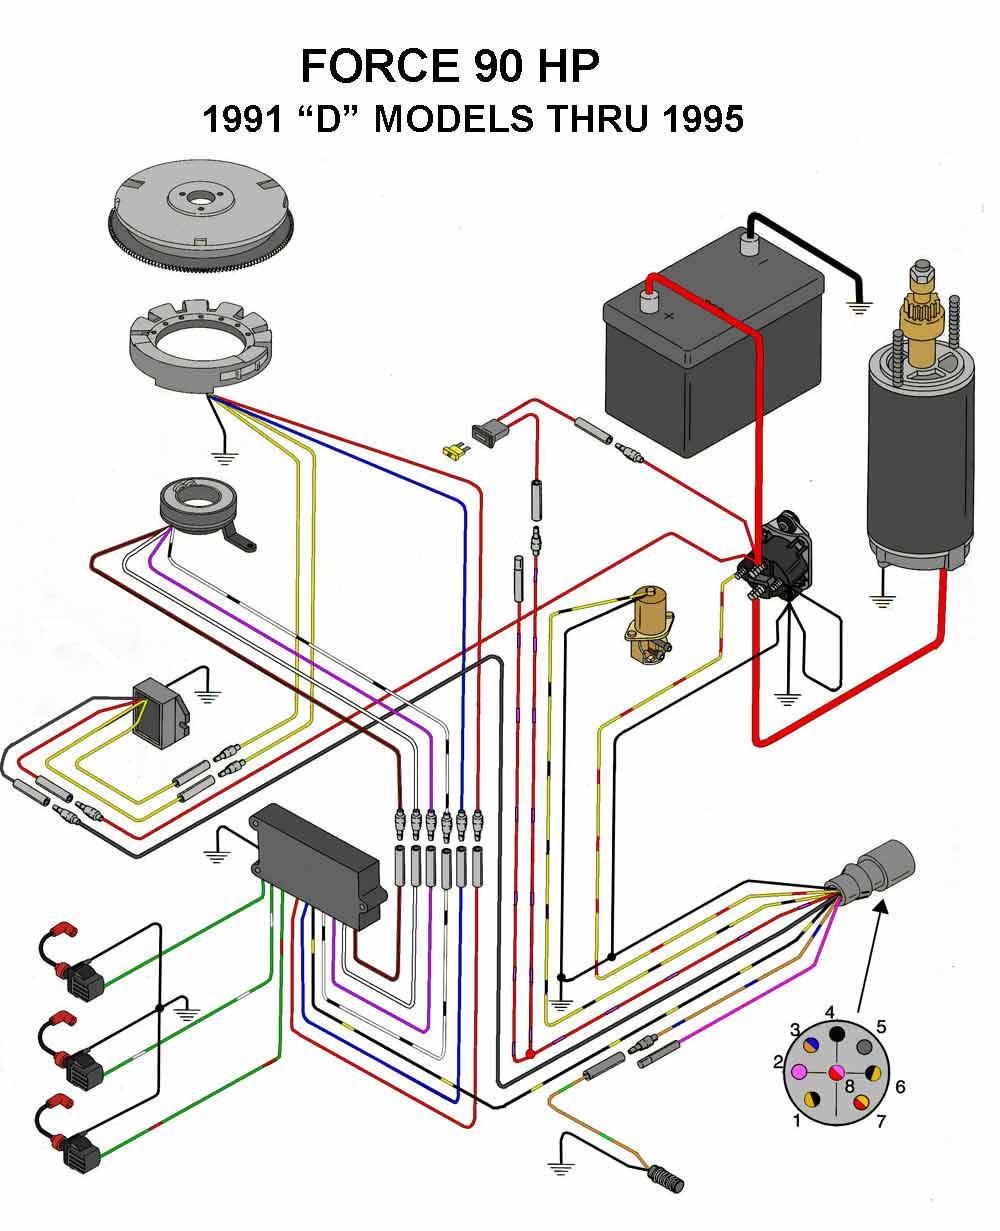 Outboard Motor Alternator Wiring - Used Outboard Motors ...